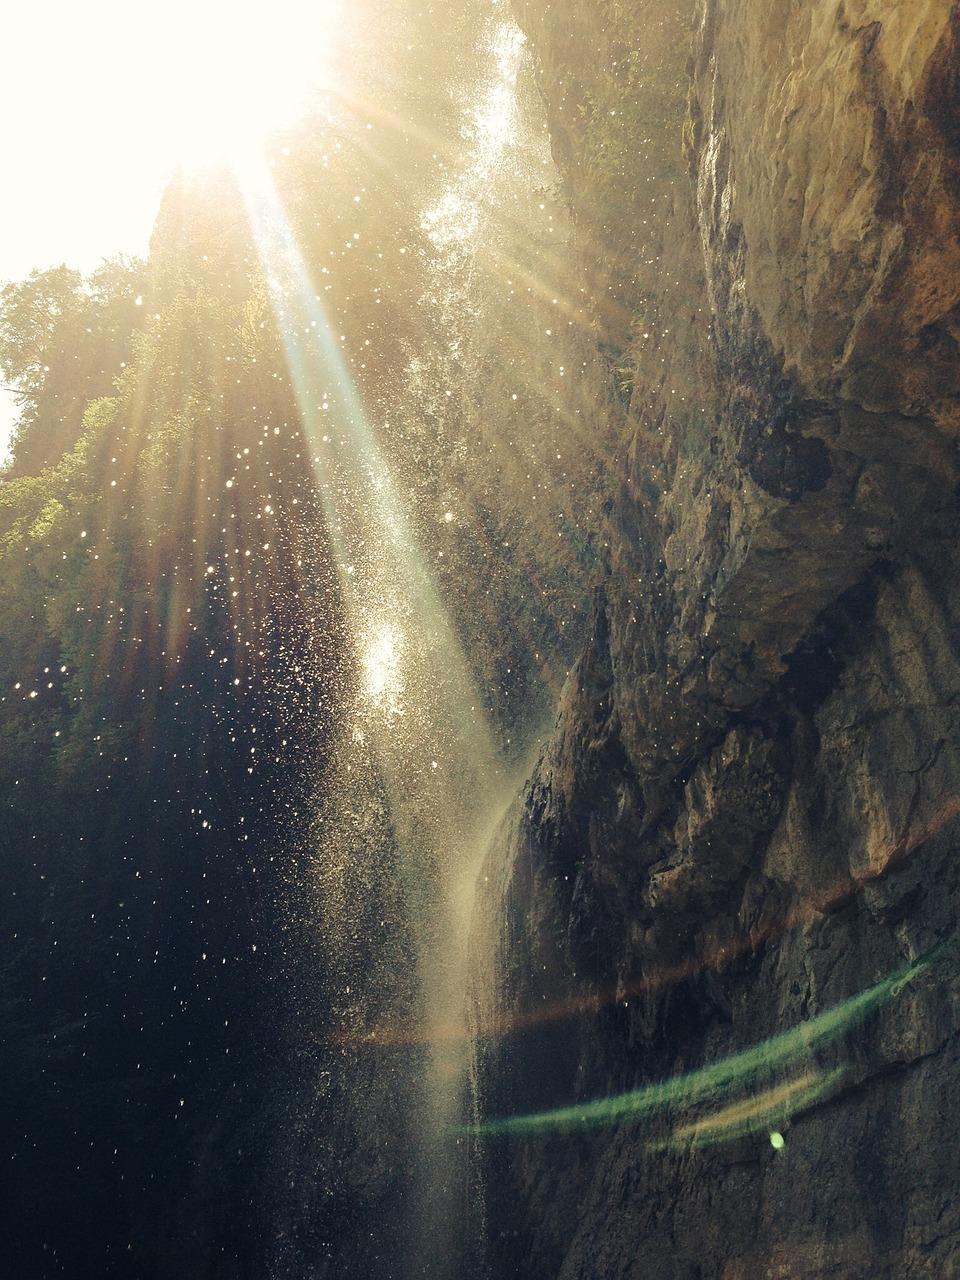 waterfall-918713_1280